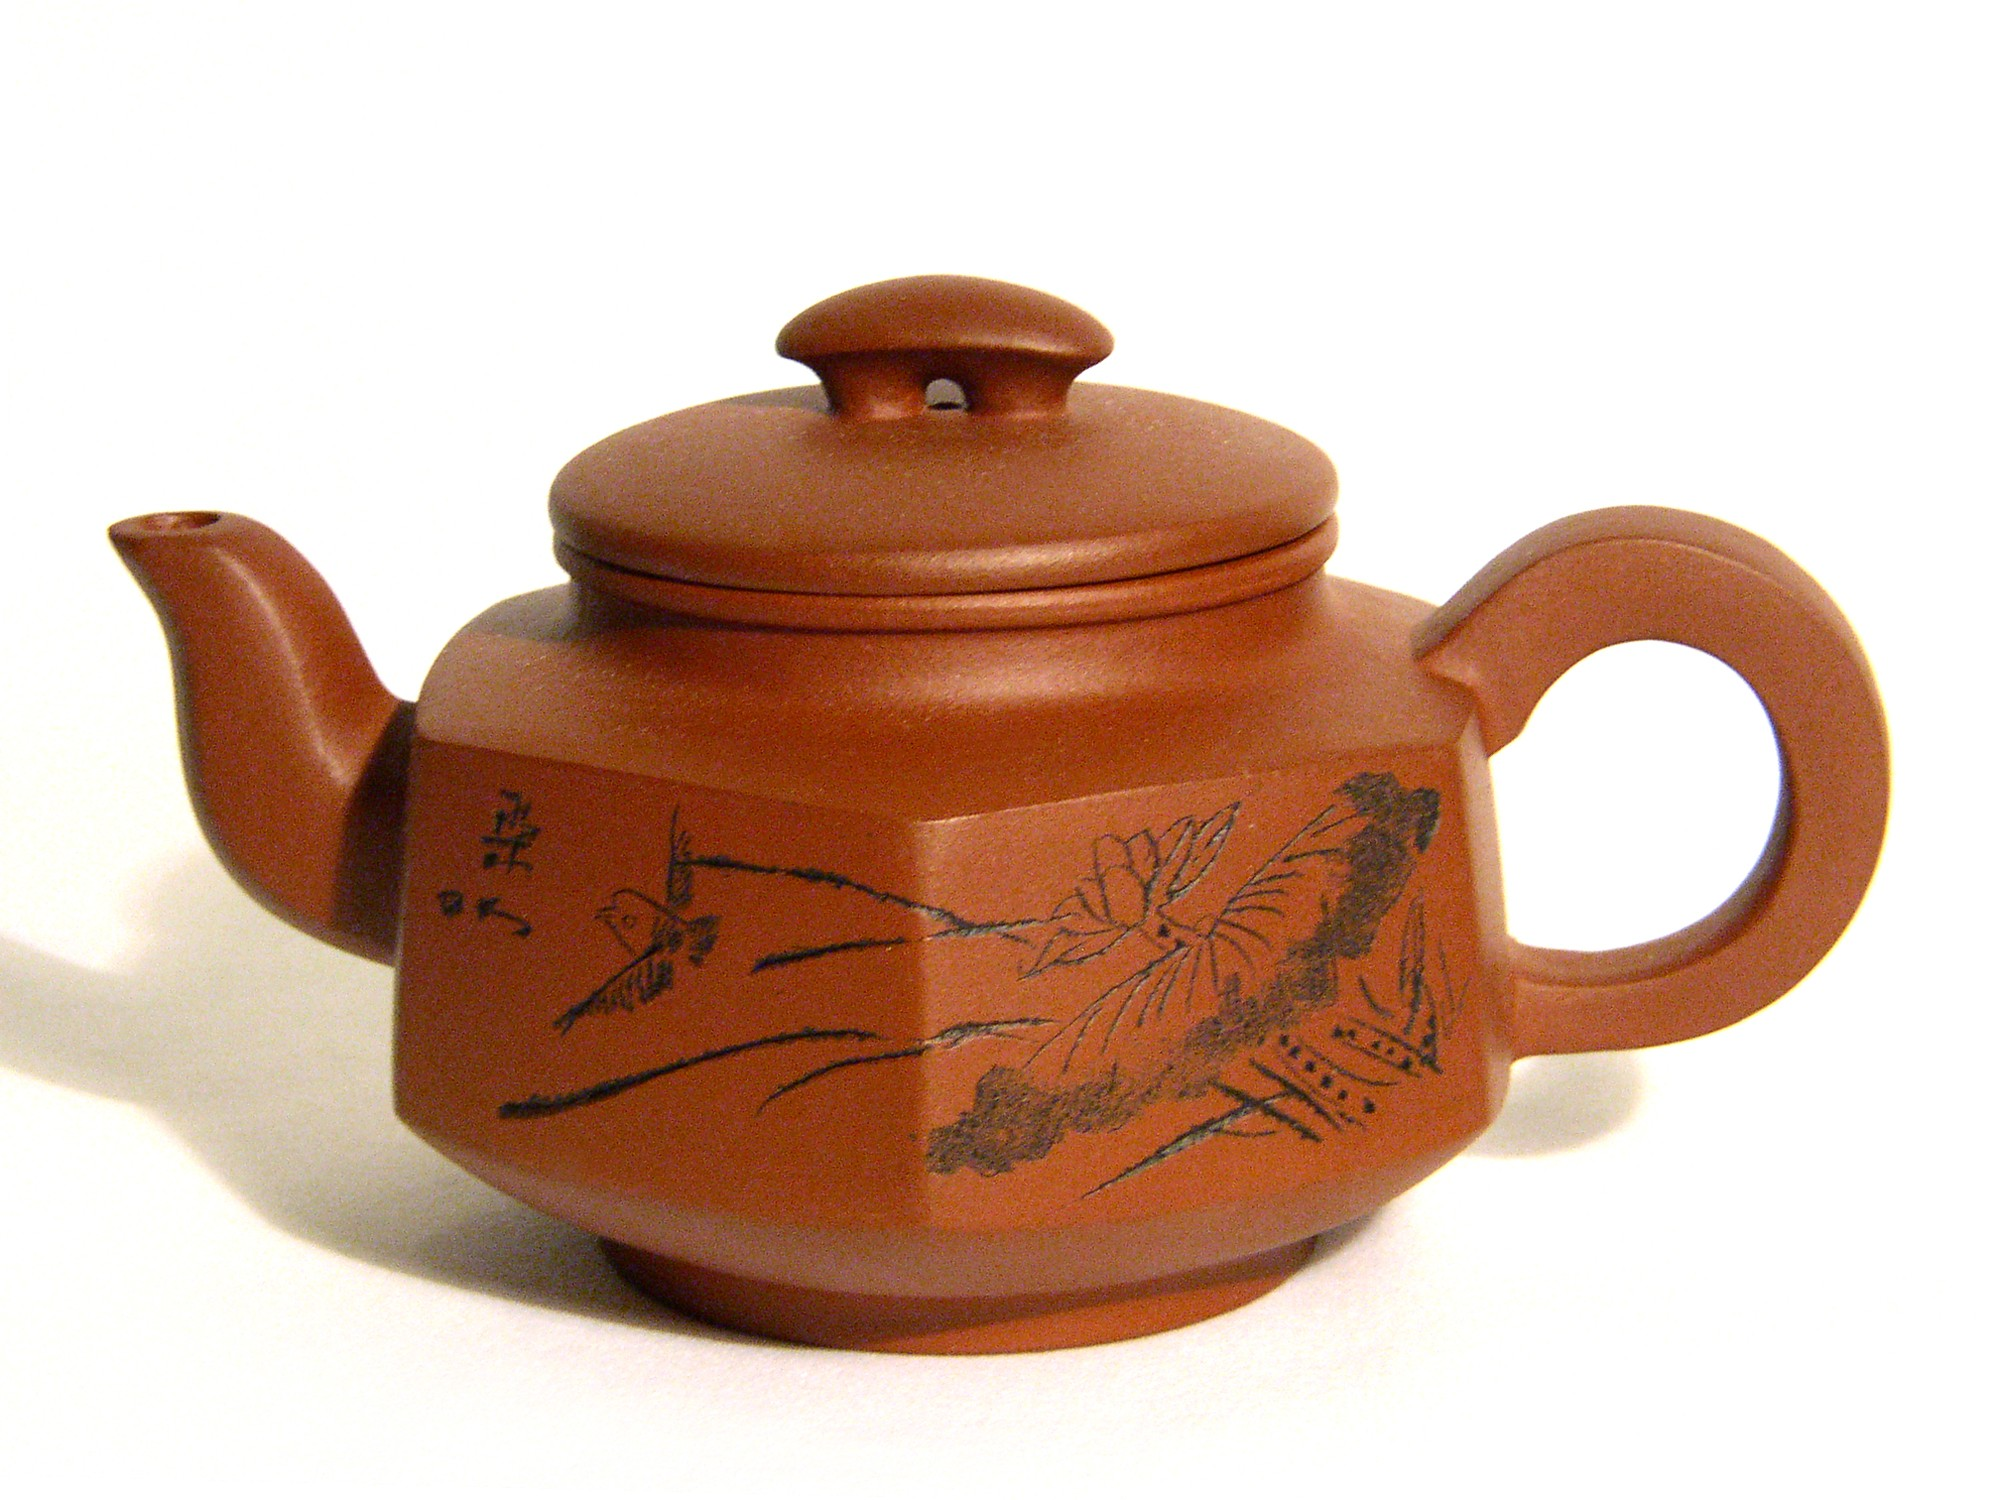 Yixing / Purple Clay Teapot - Etched Bird